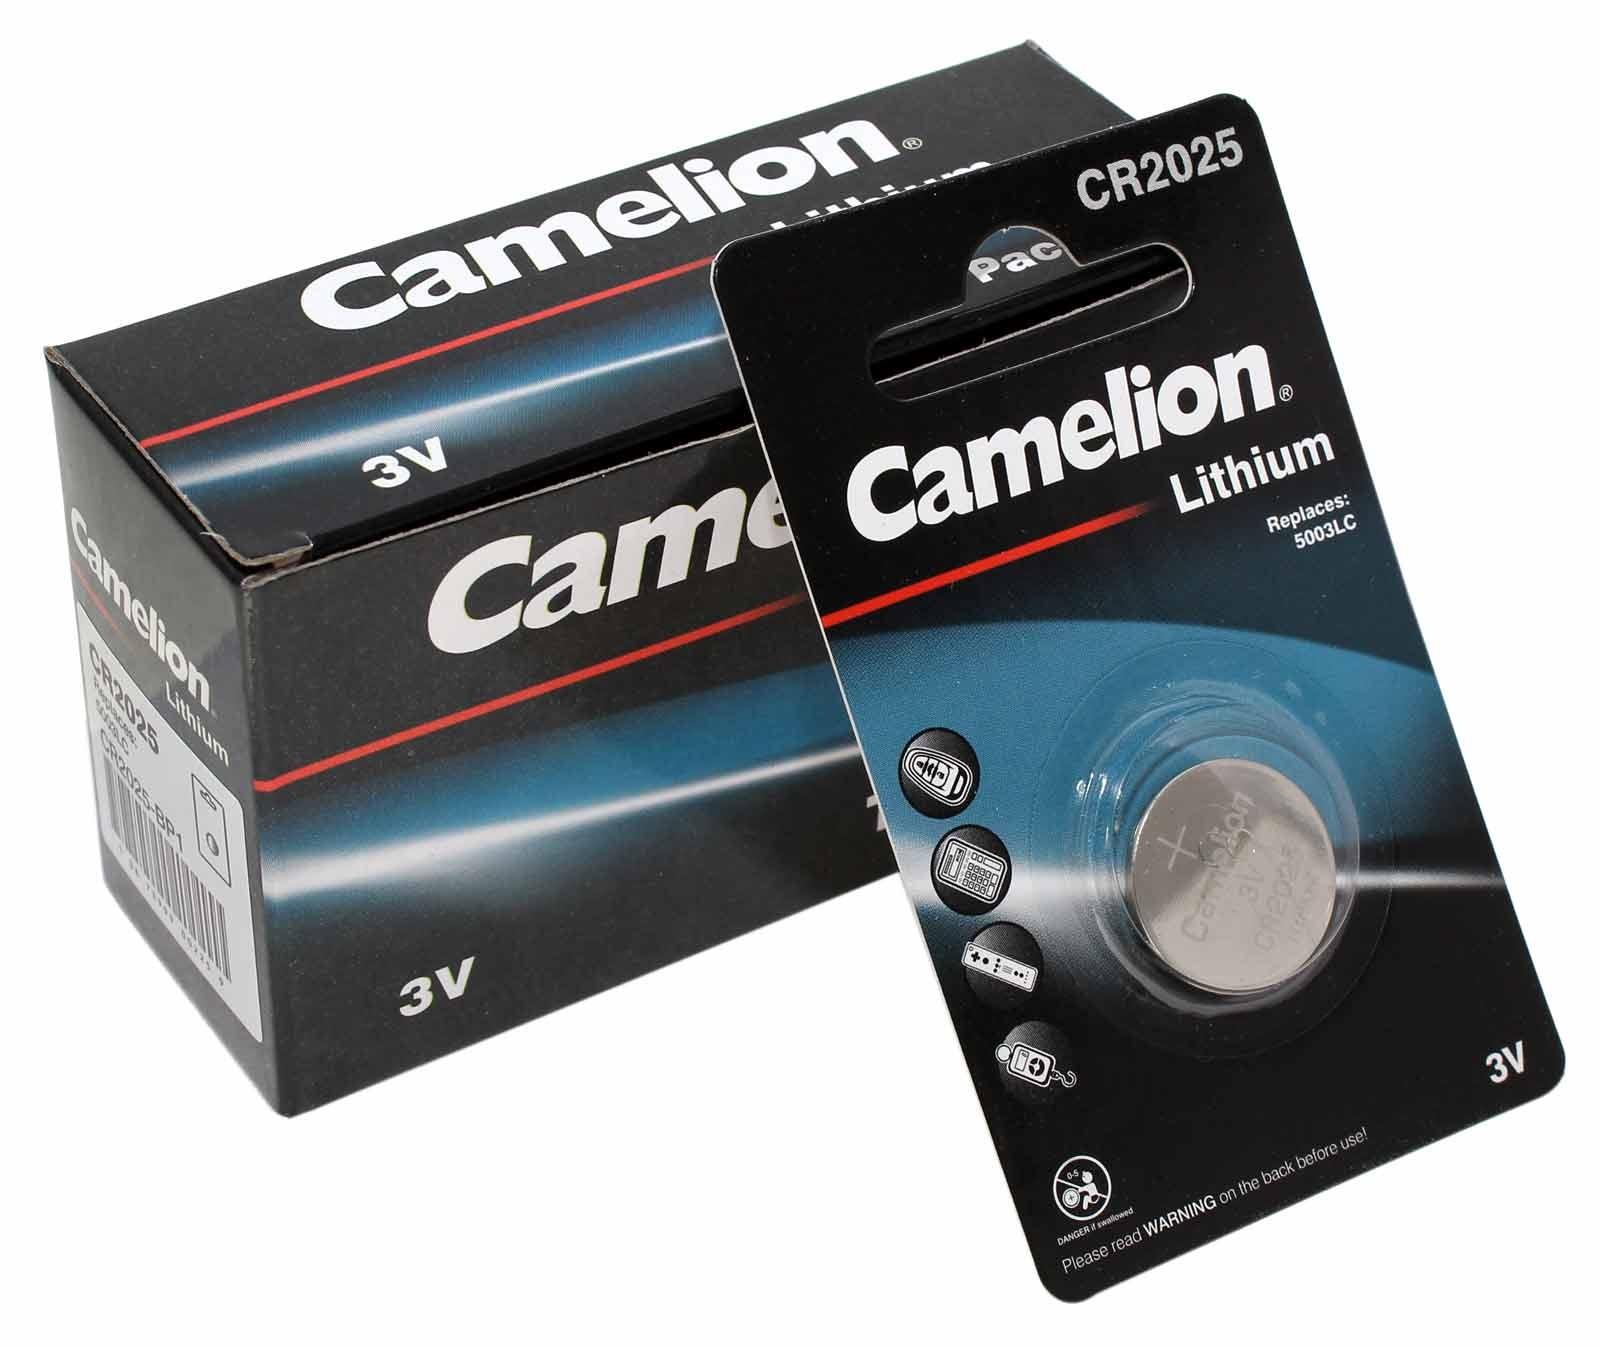 10x Camelion CR2025 [CR2025-BP1] Lithium Knopfzelle Batterie, DL2015, 5003LC, E-CR2025, 3V, 150mAh